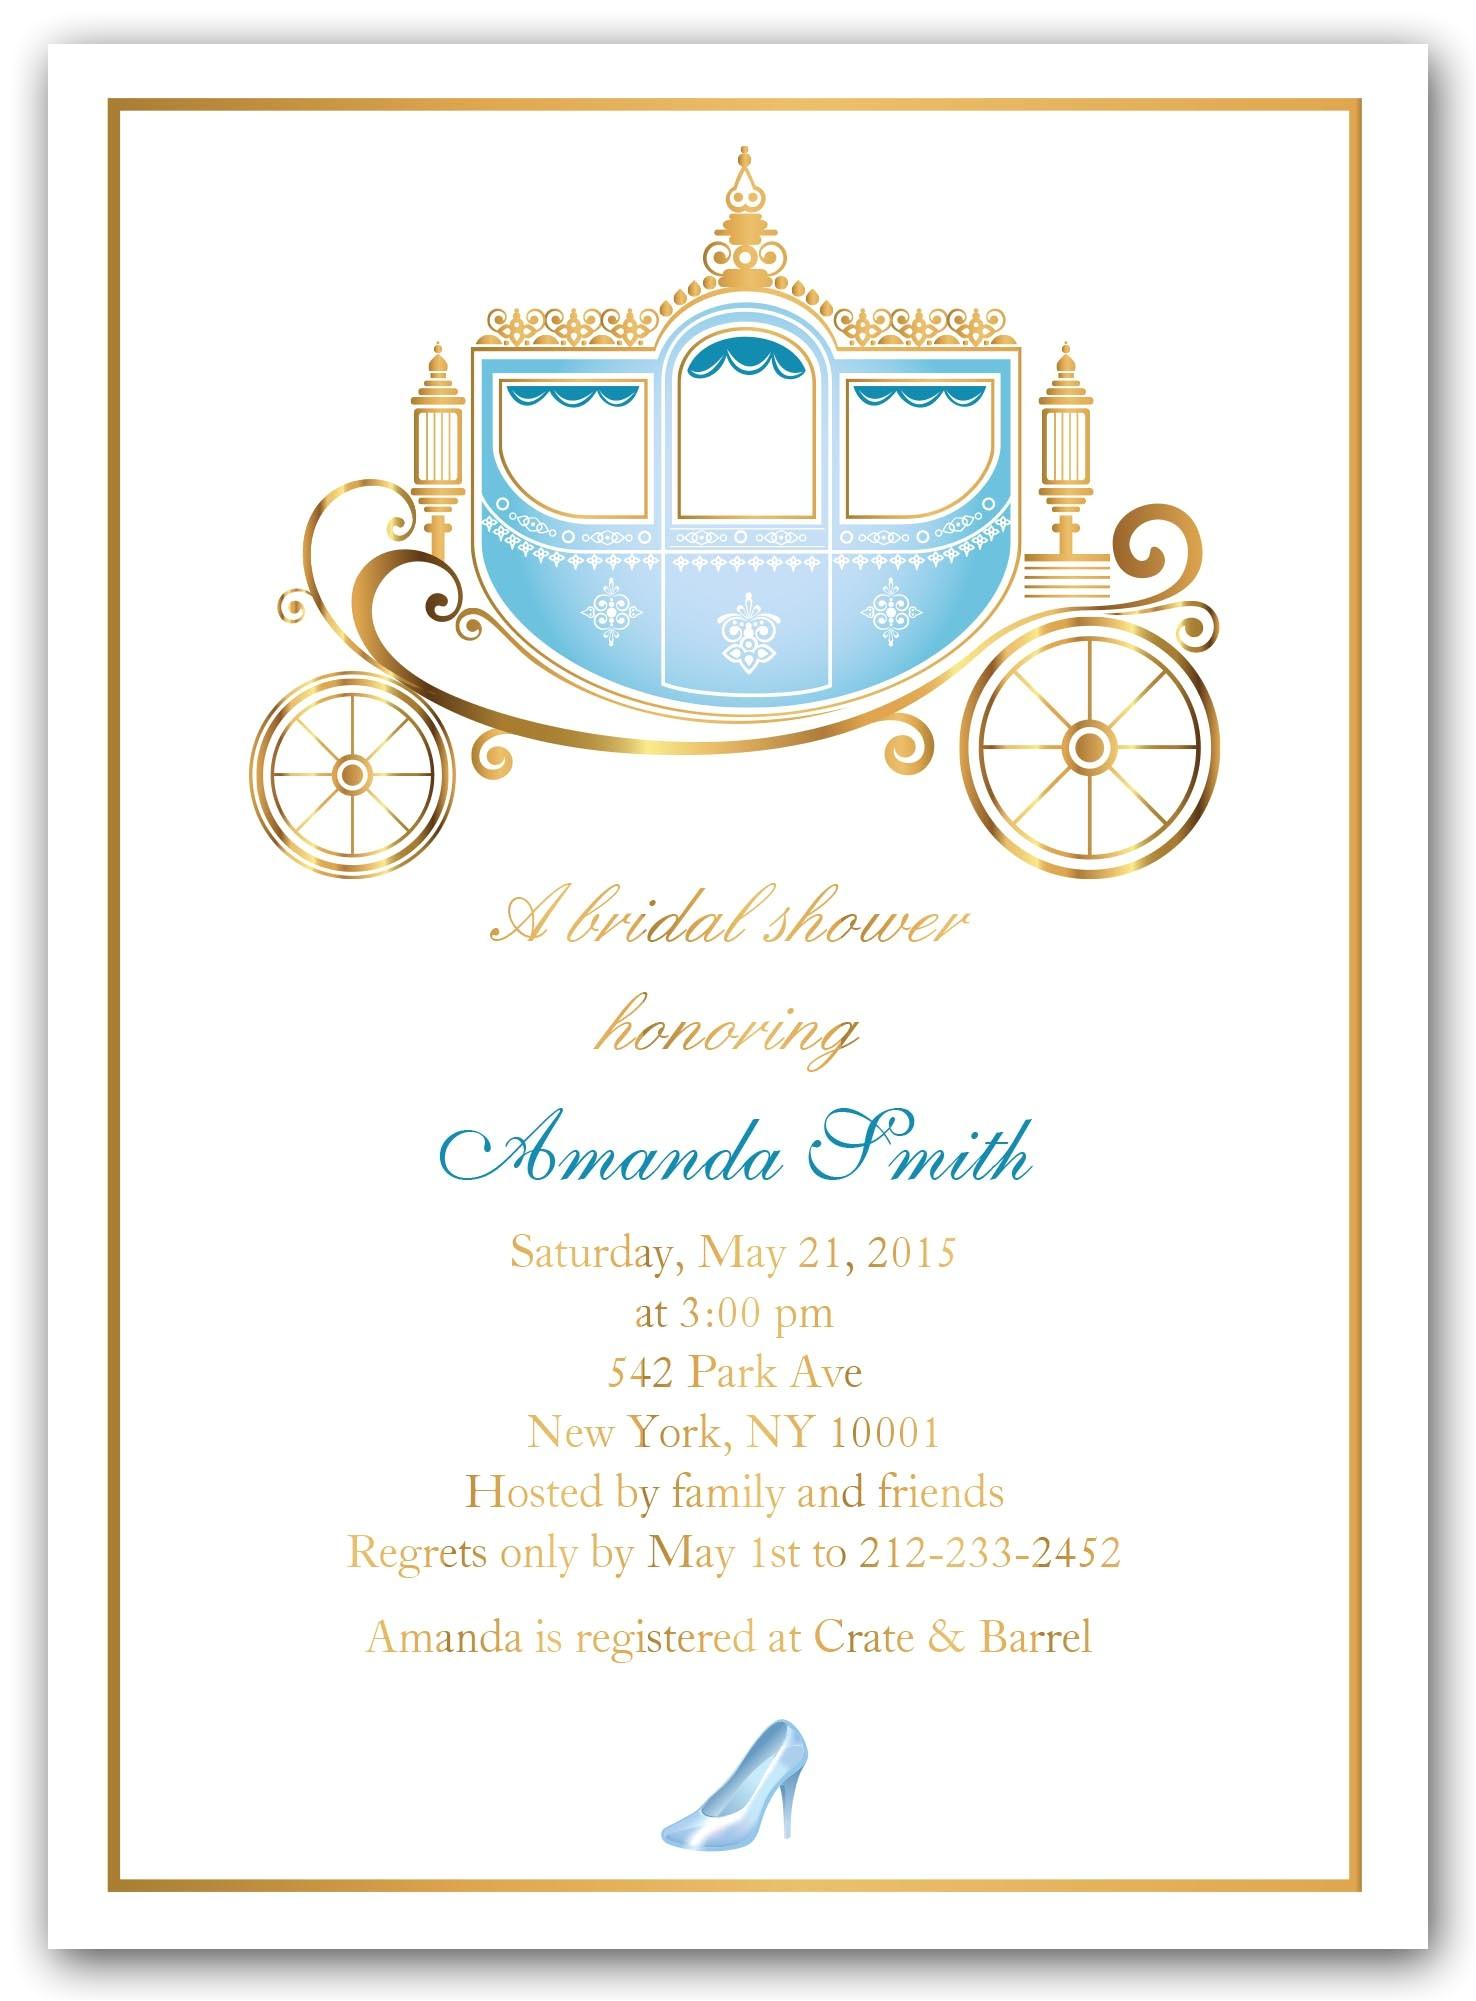 Cinderella themed Bridal Shower Invitations Bridal Shower Invitations Bridal Shower Invitations